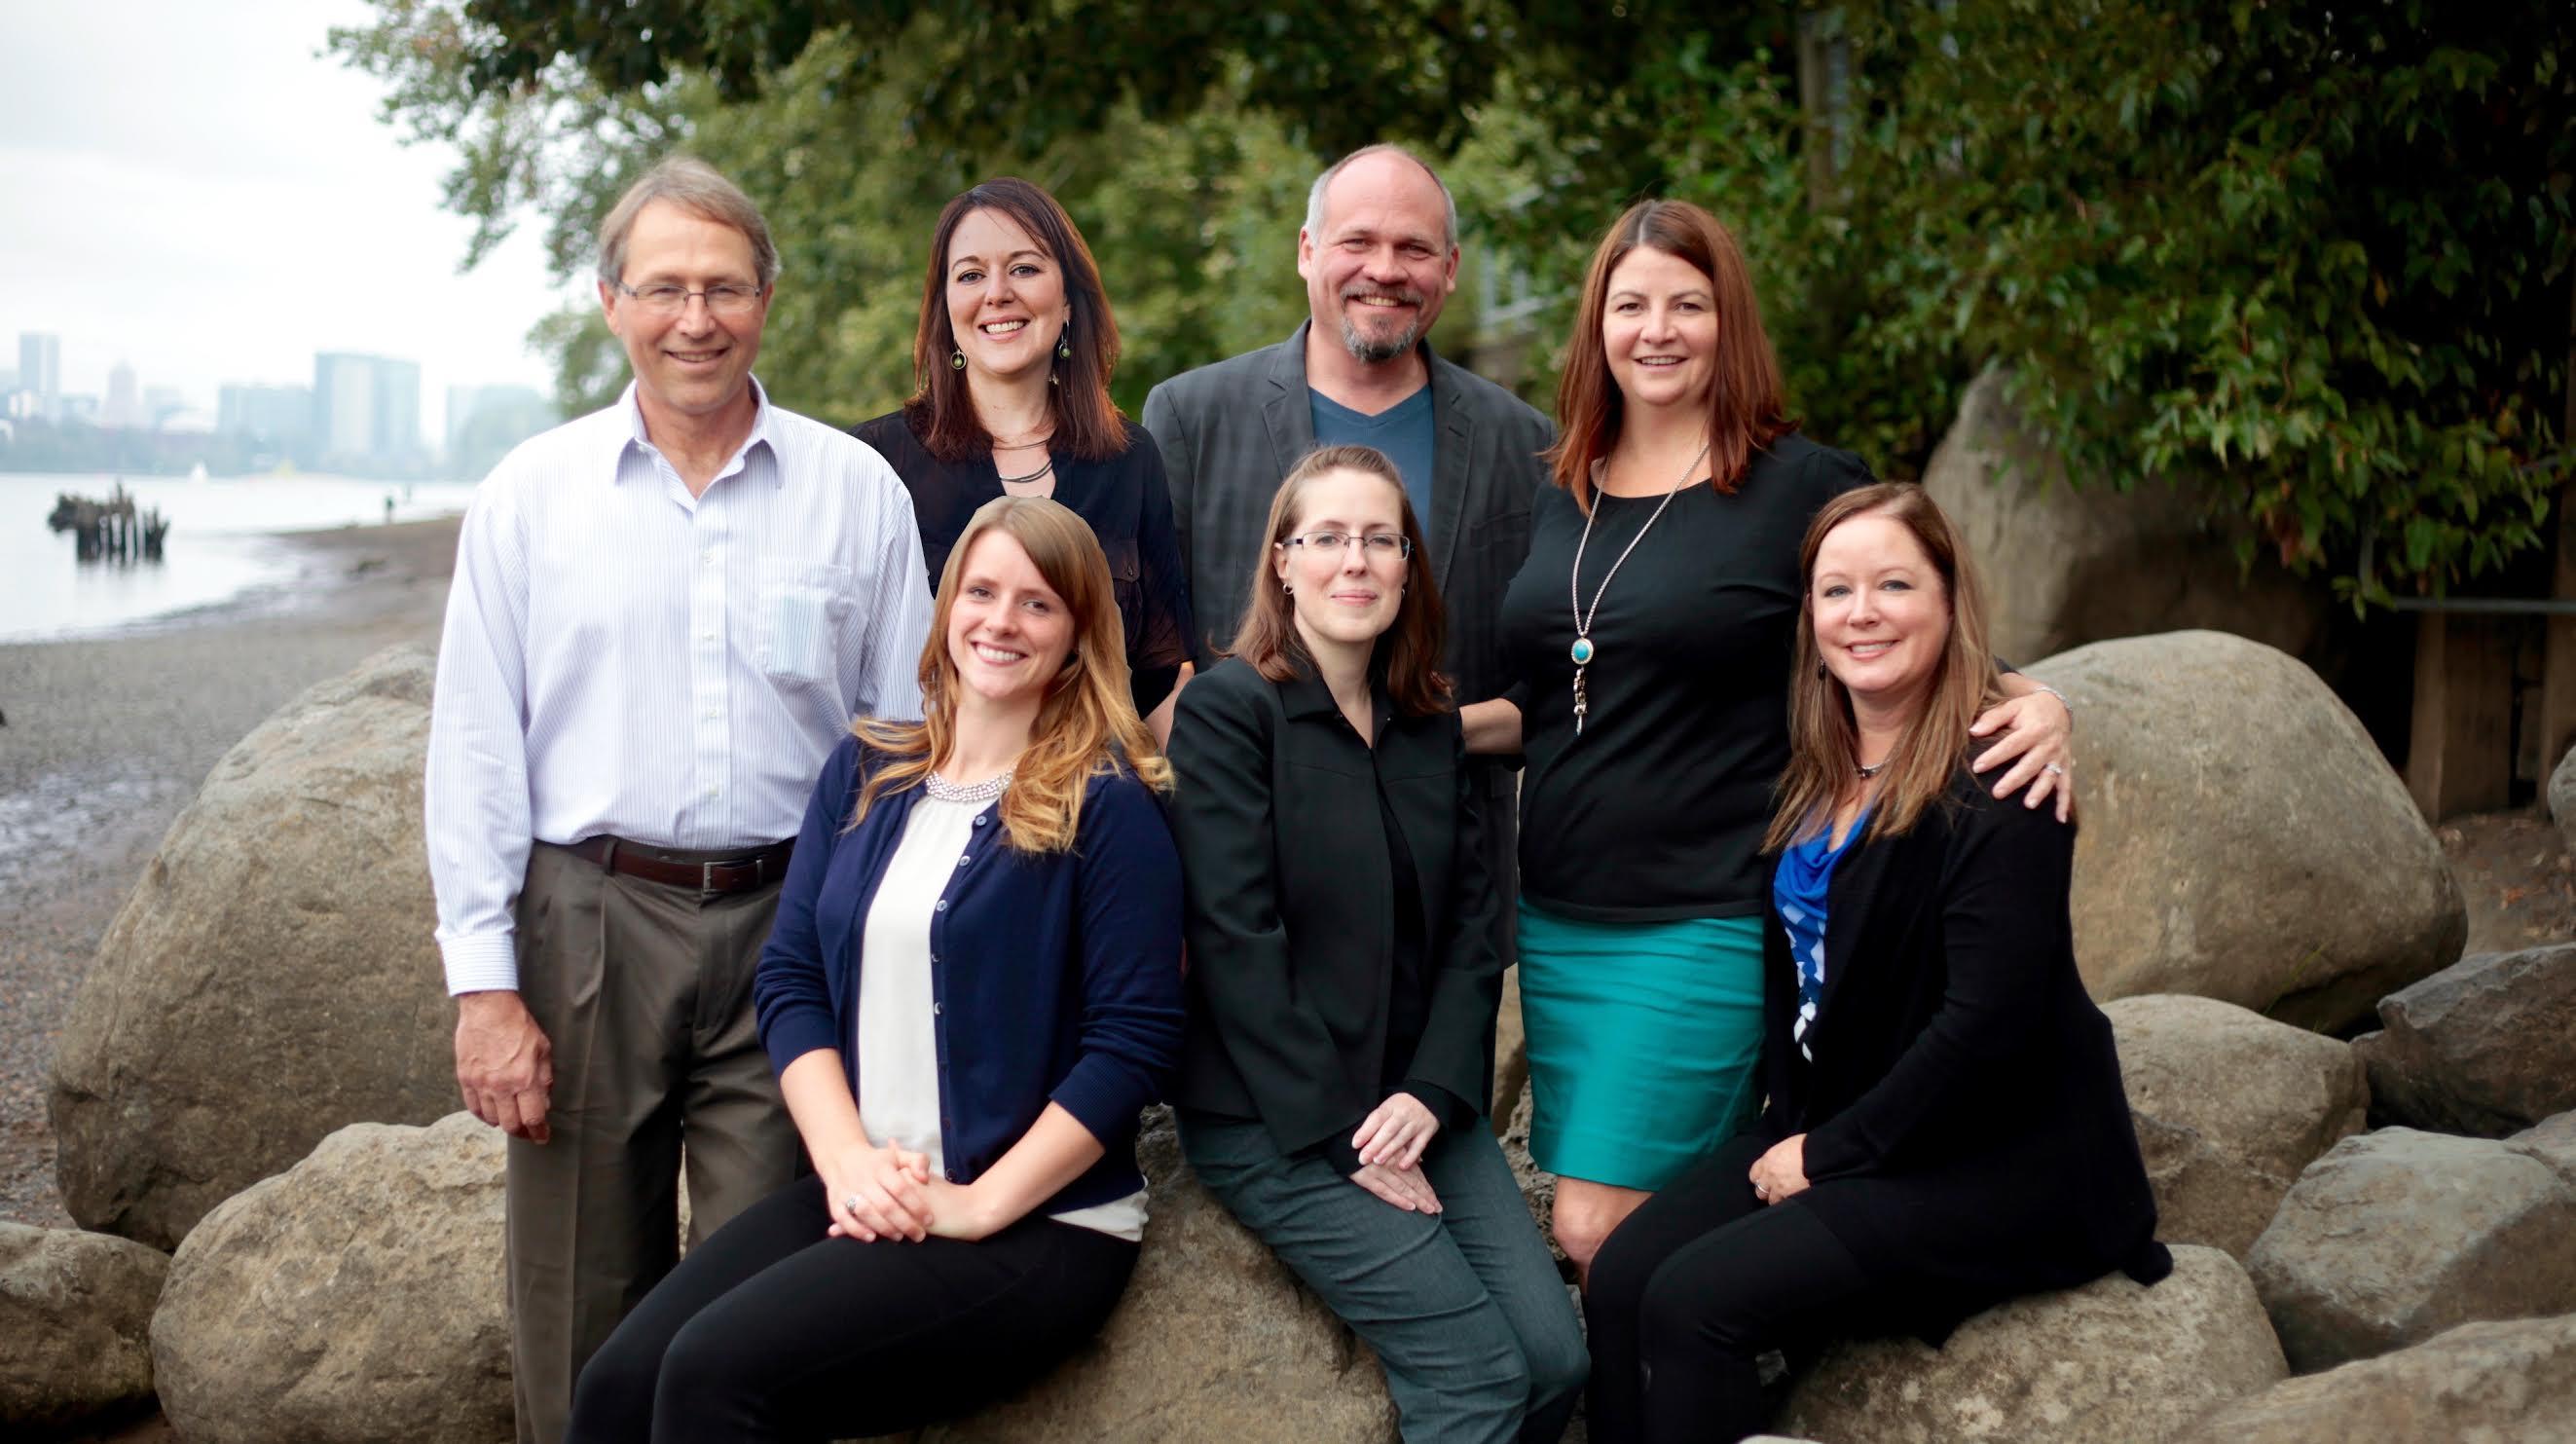 Team Photo - Oct. 2015